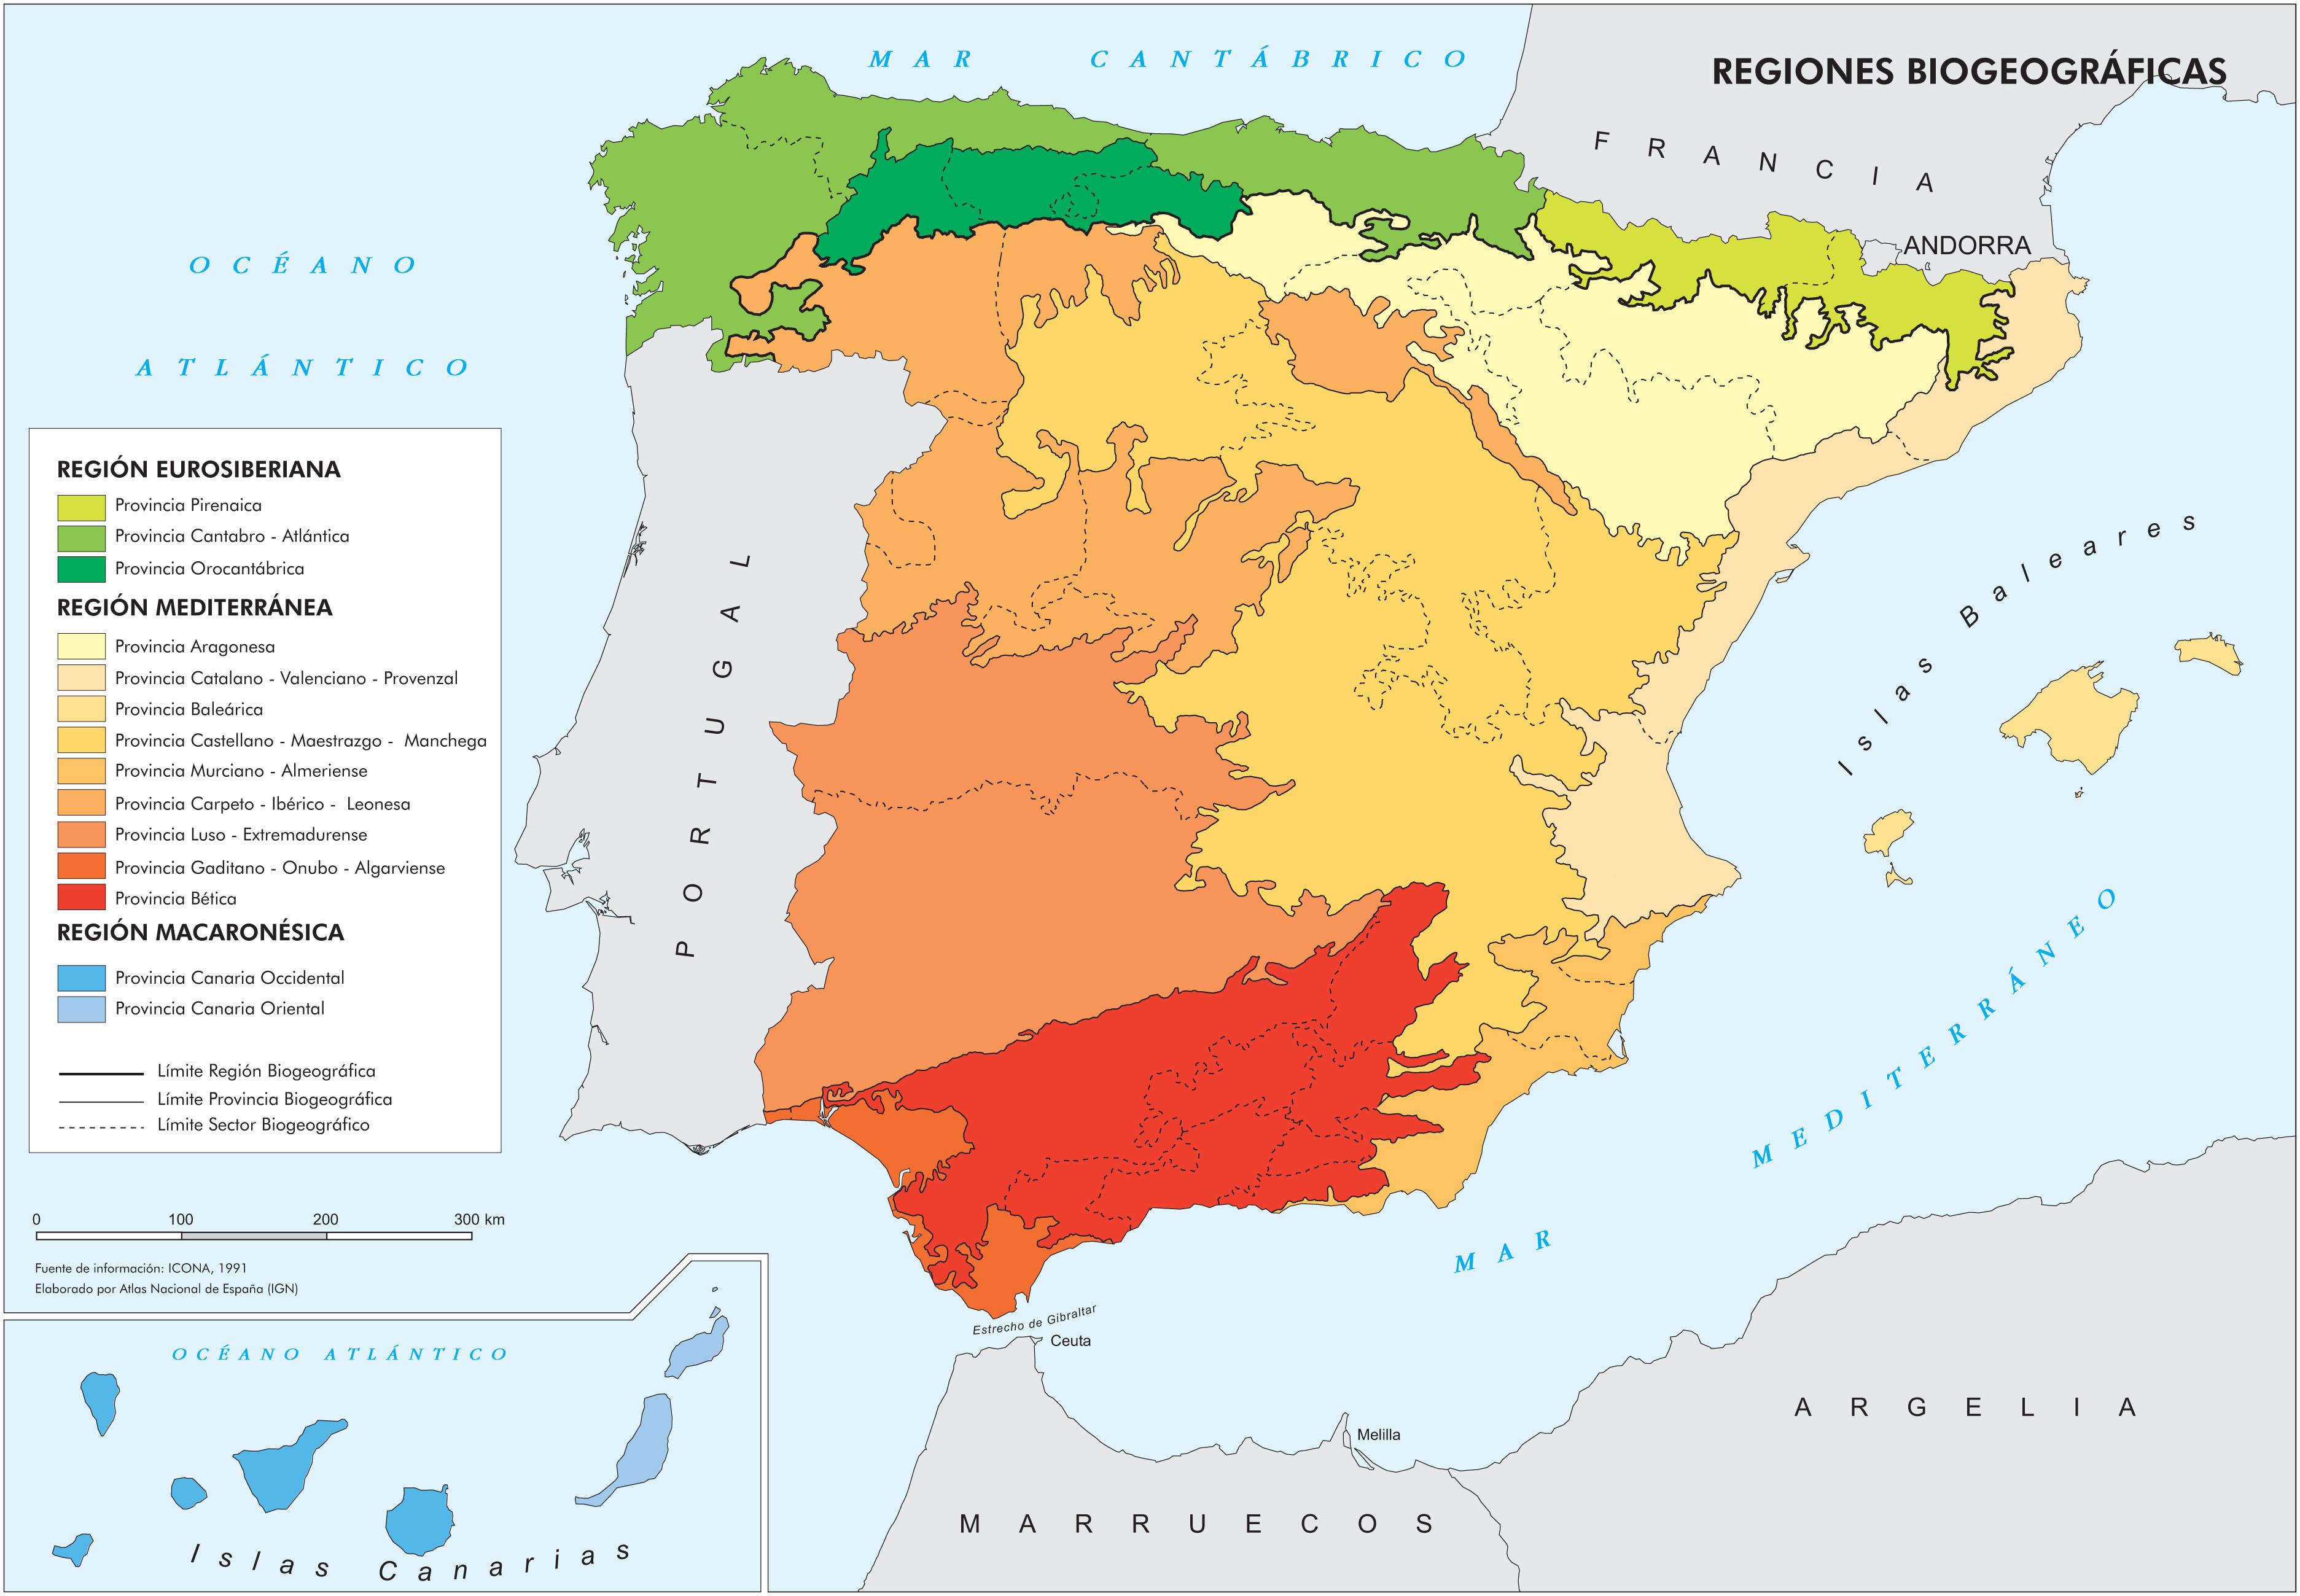 Biogeographic regions of Spain